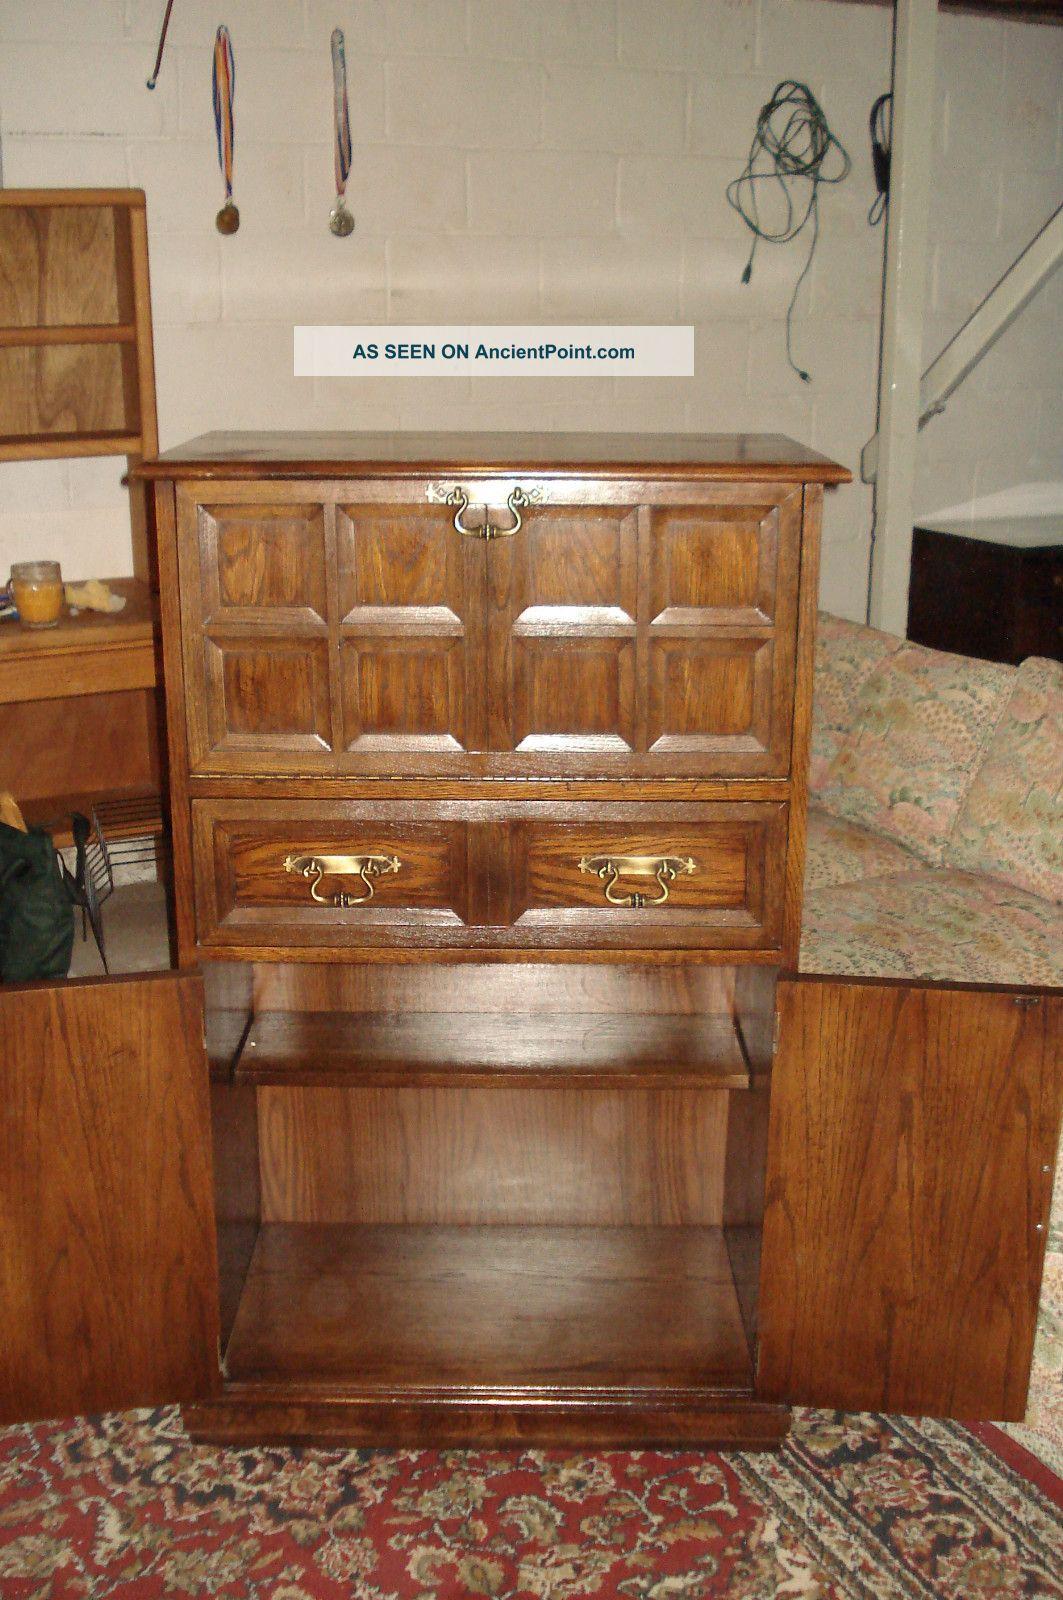 Lane Liquor Cabinet Bar With Lock Key Light Inside Vintage Mid Century Furniture Post-1950 photo